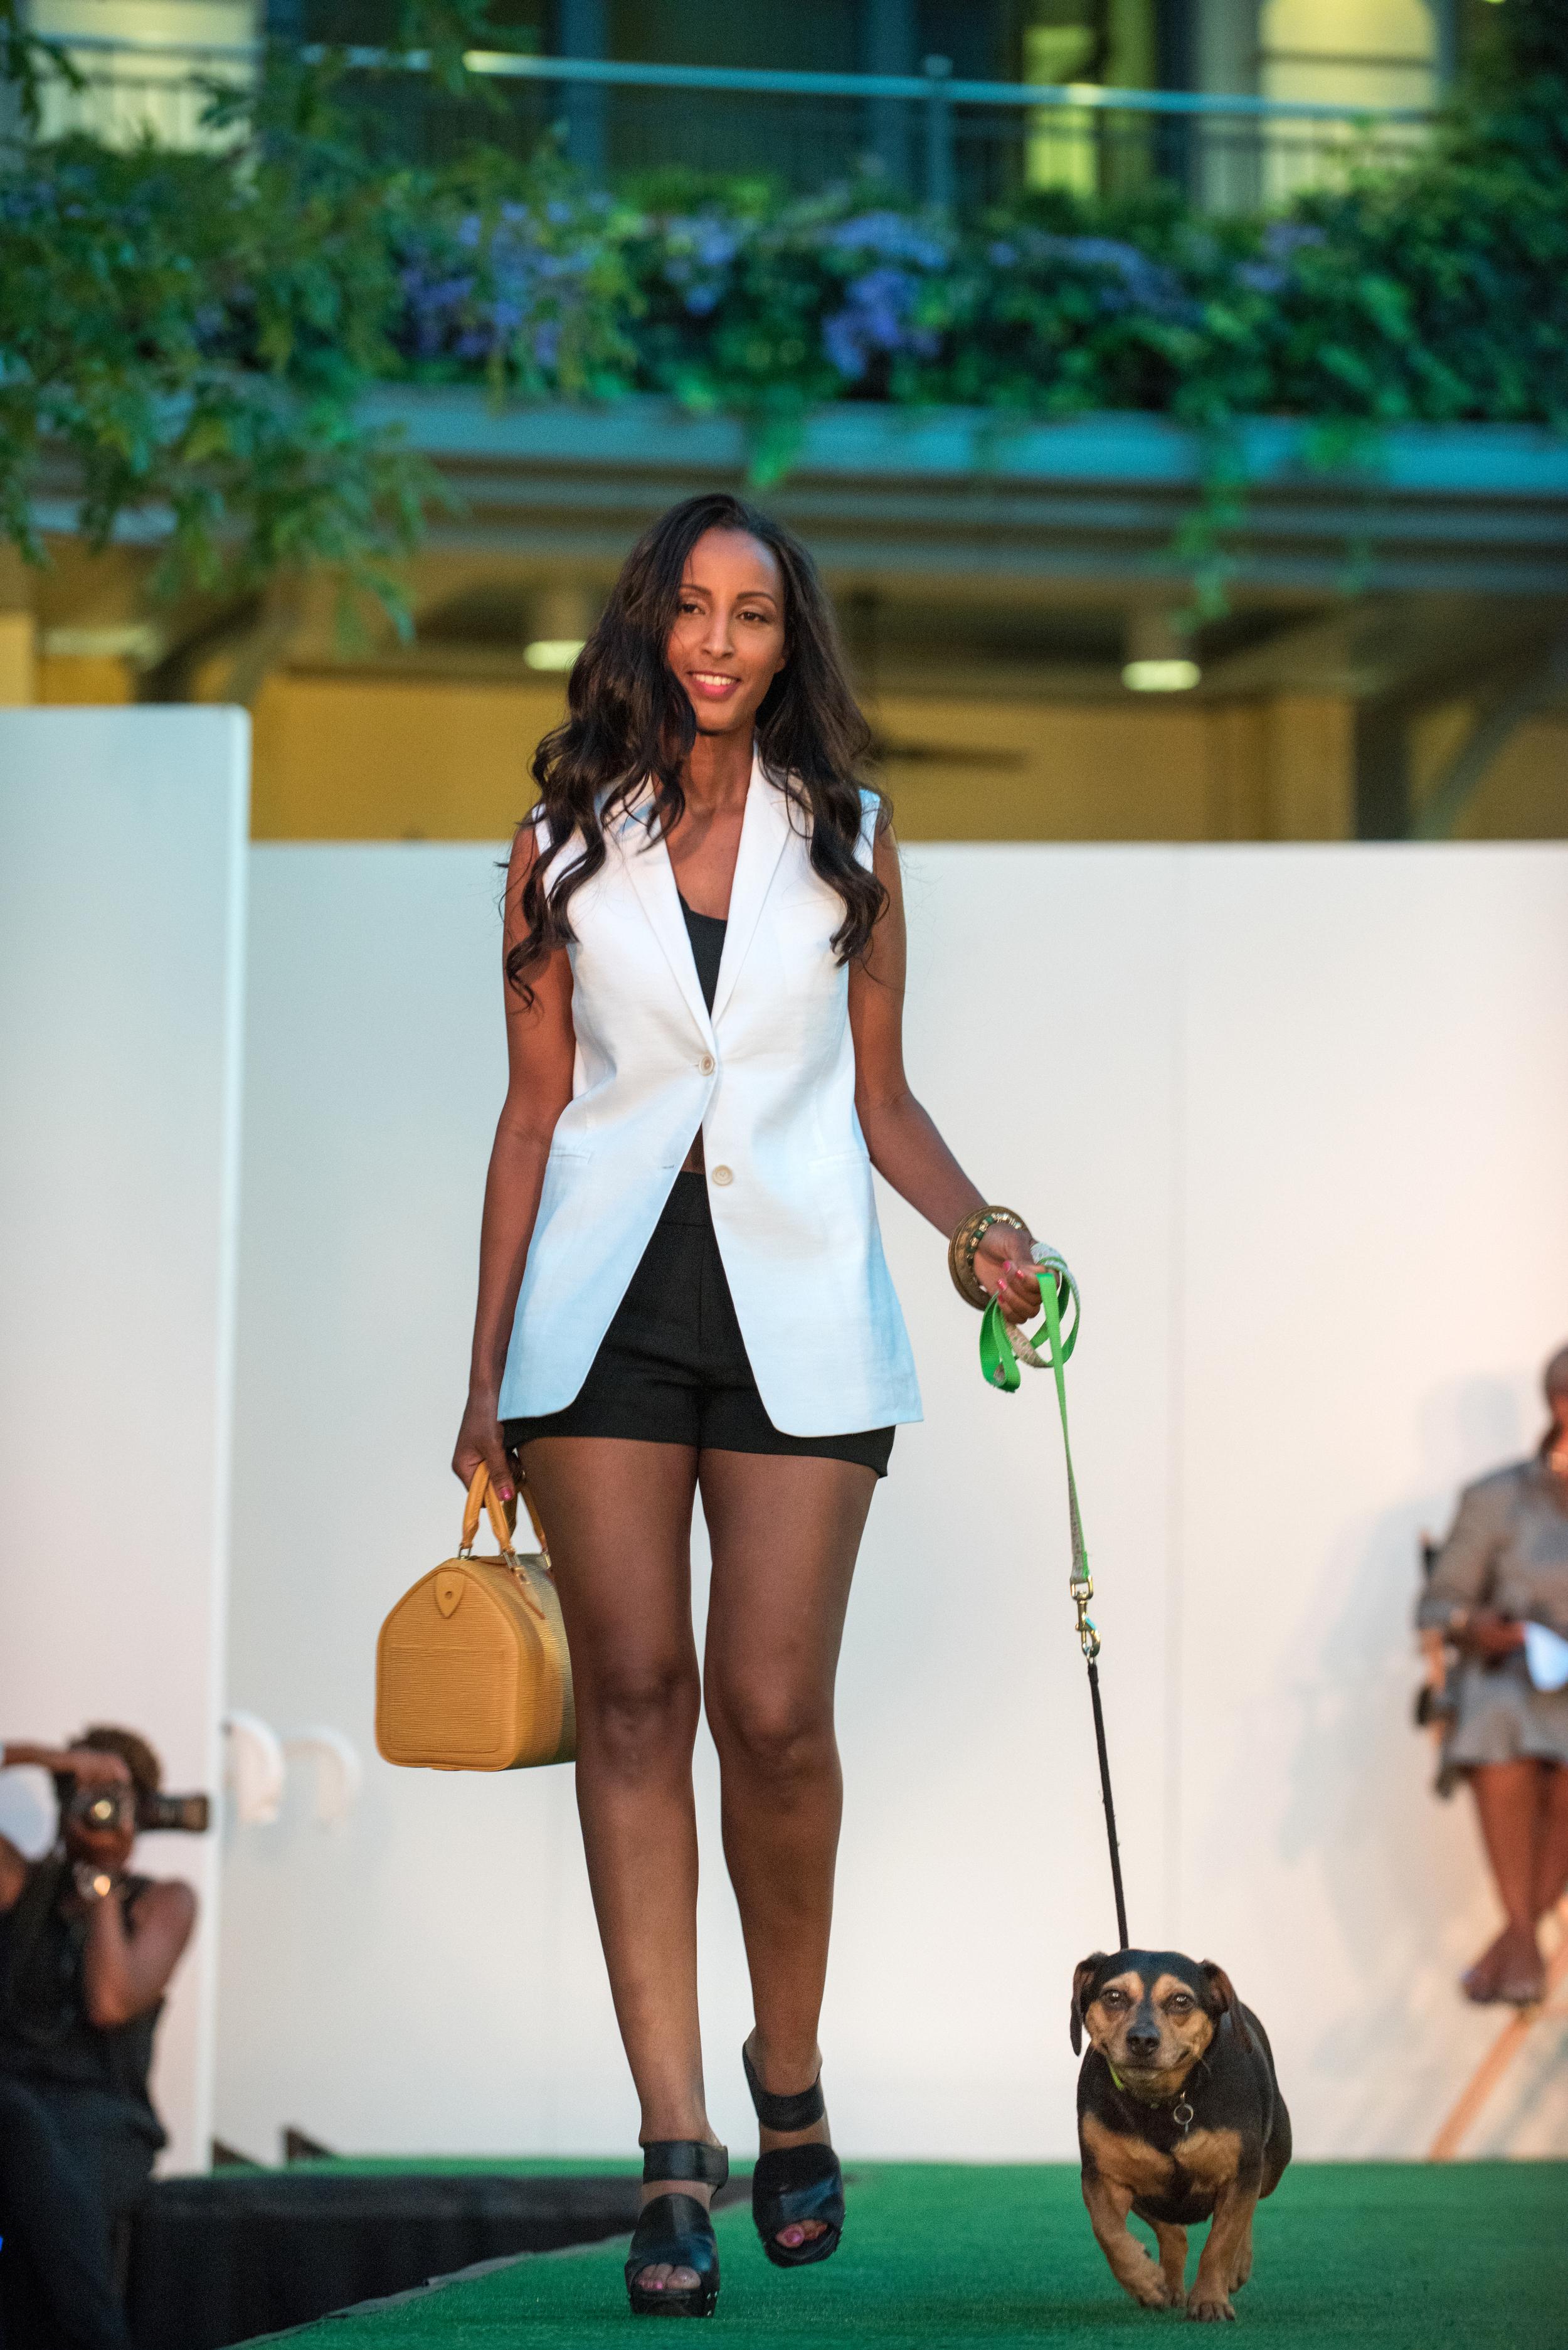 Faven Ressom & Kabob / Louis Vuitton - Bella Bag